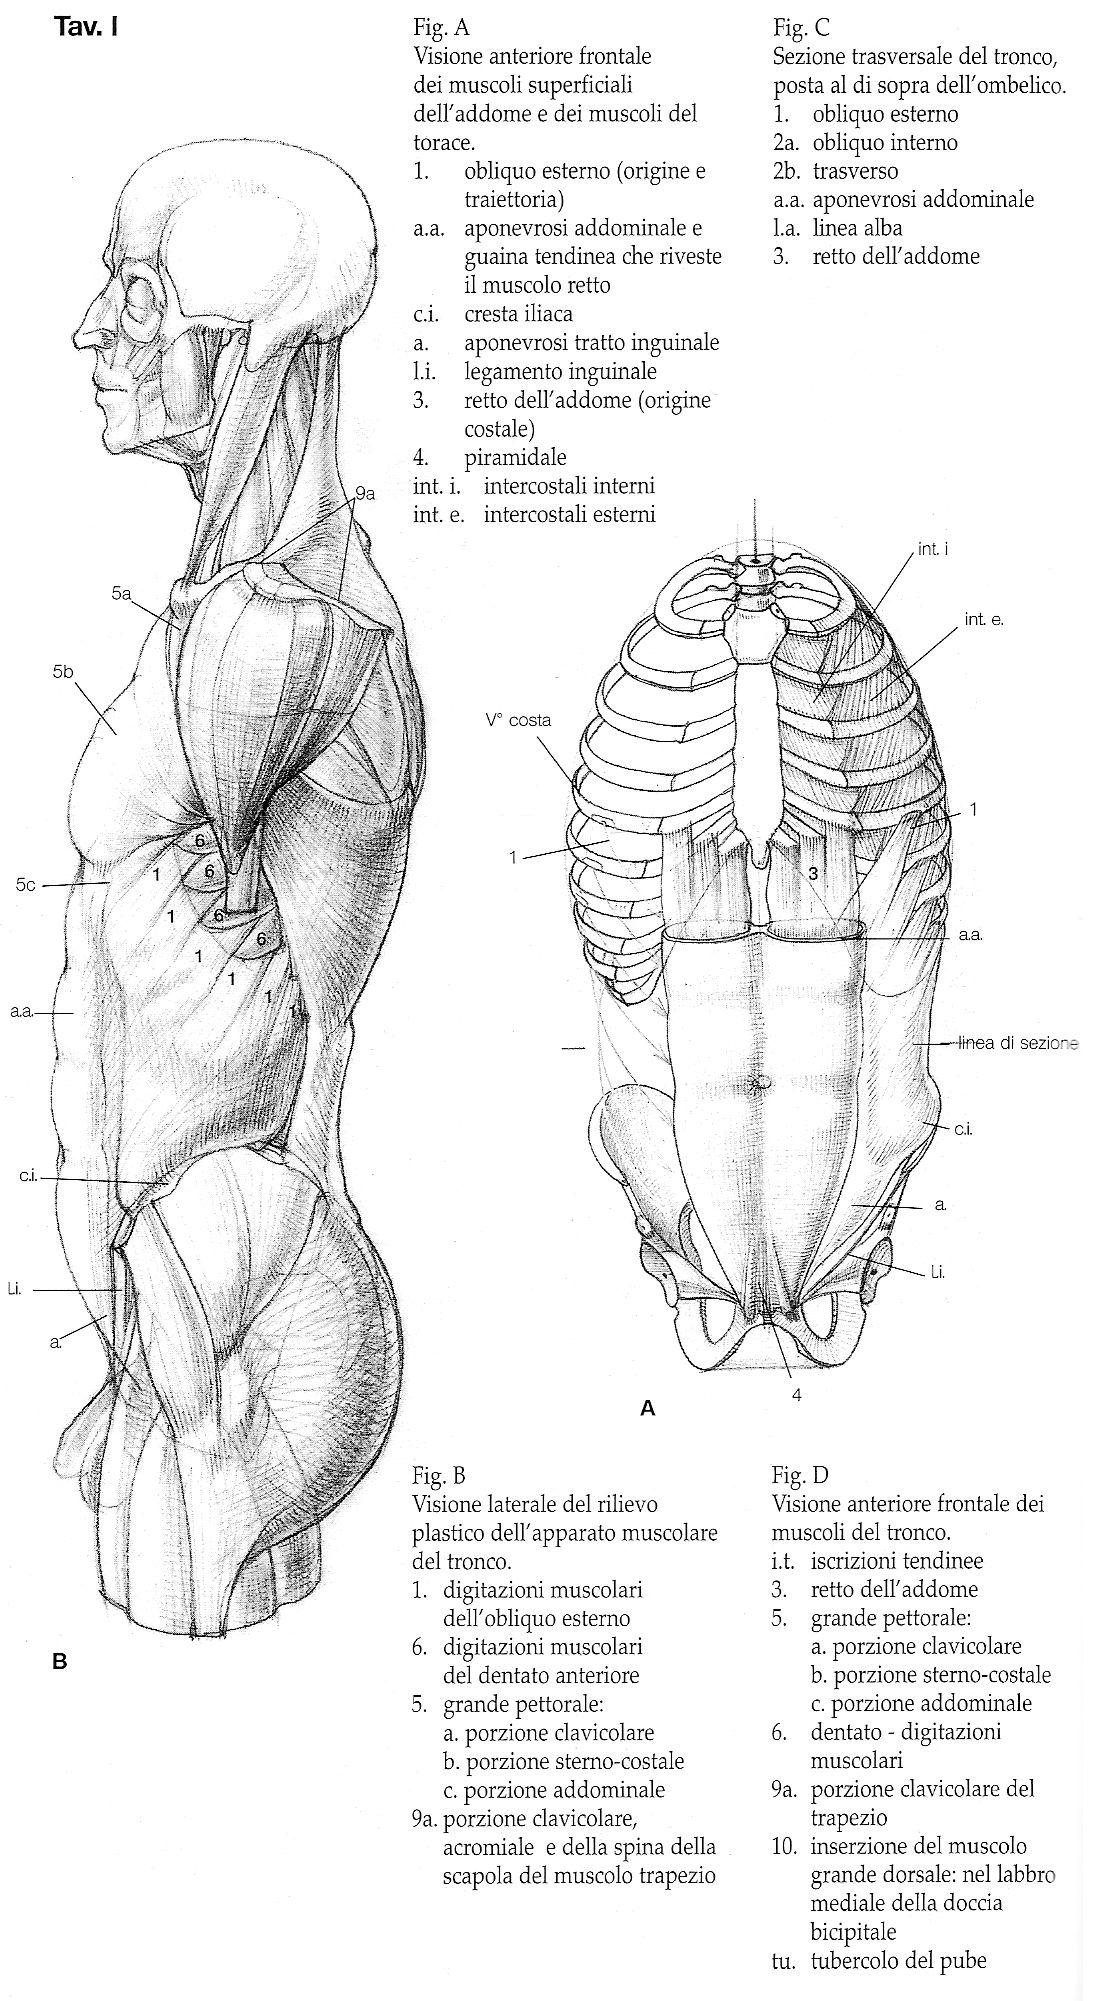 Pin by Caviar Yu on anatomy | Pinterest | Character design ...